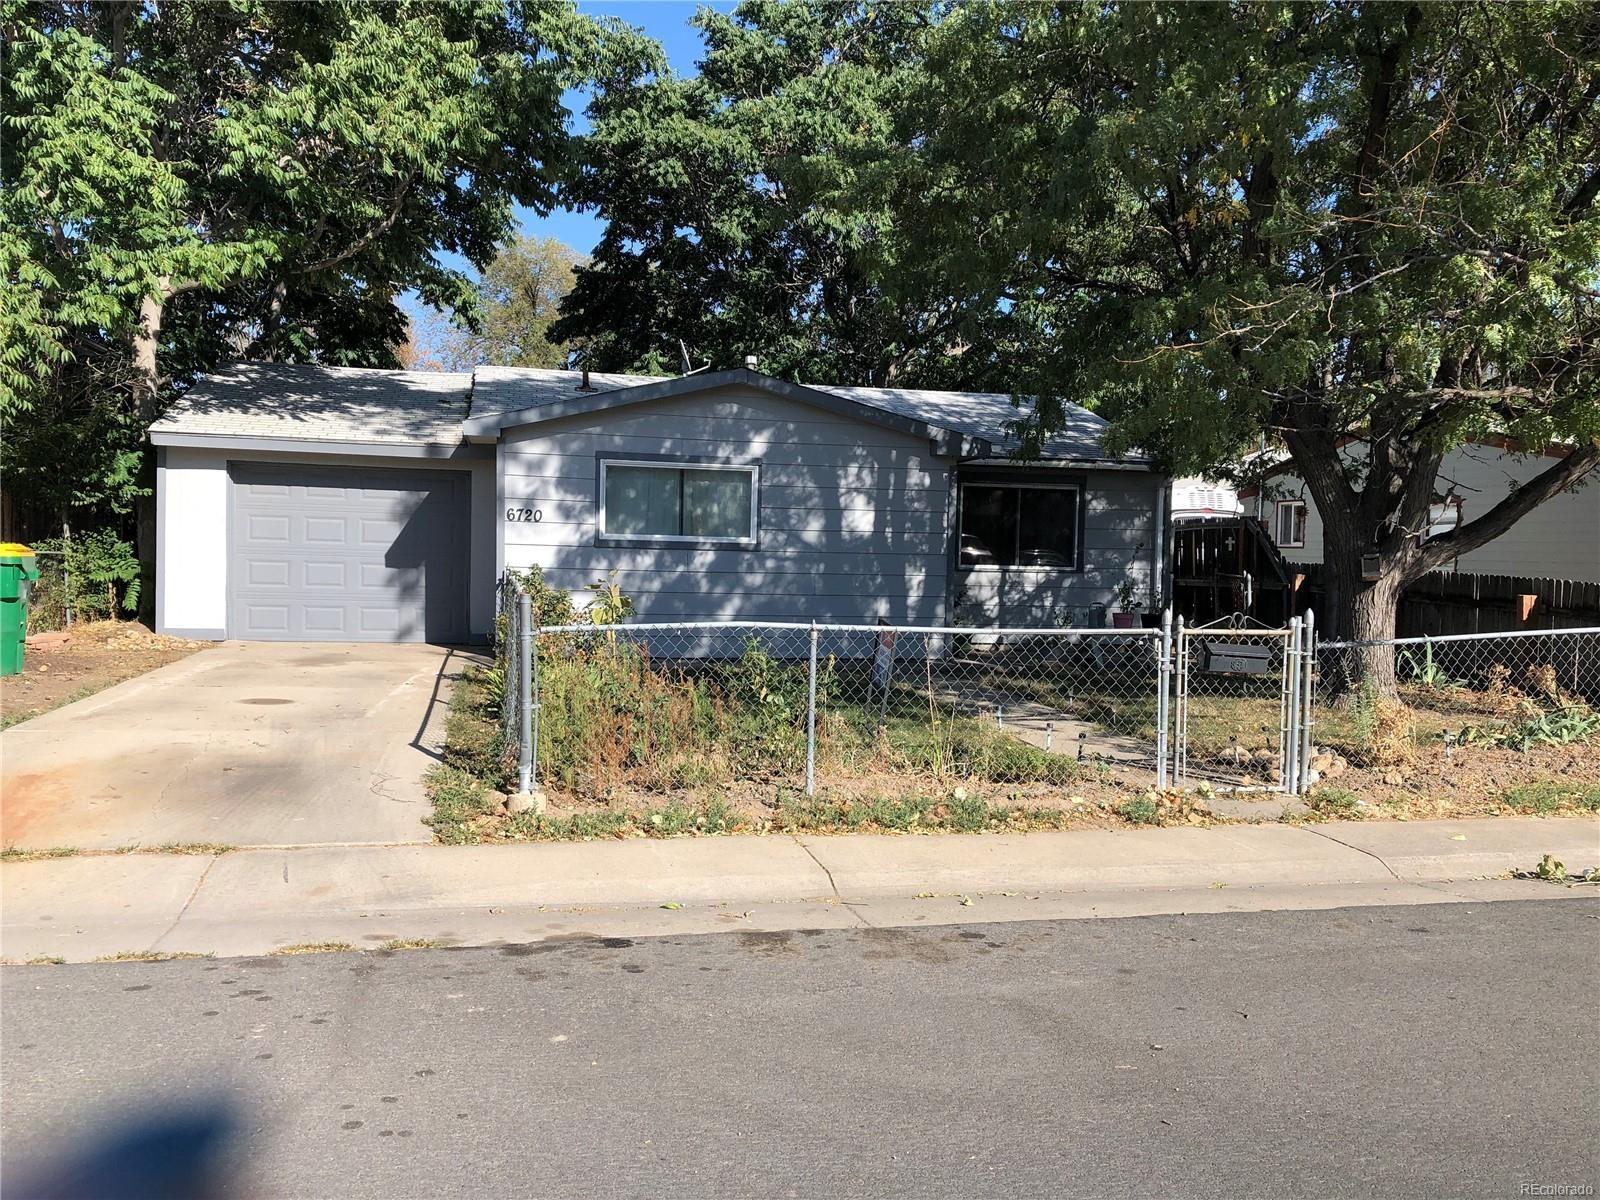 MLS# 3707280 - 1 - 6720 Birch Street, Commerce City, CO 80022